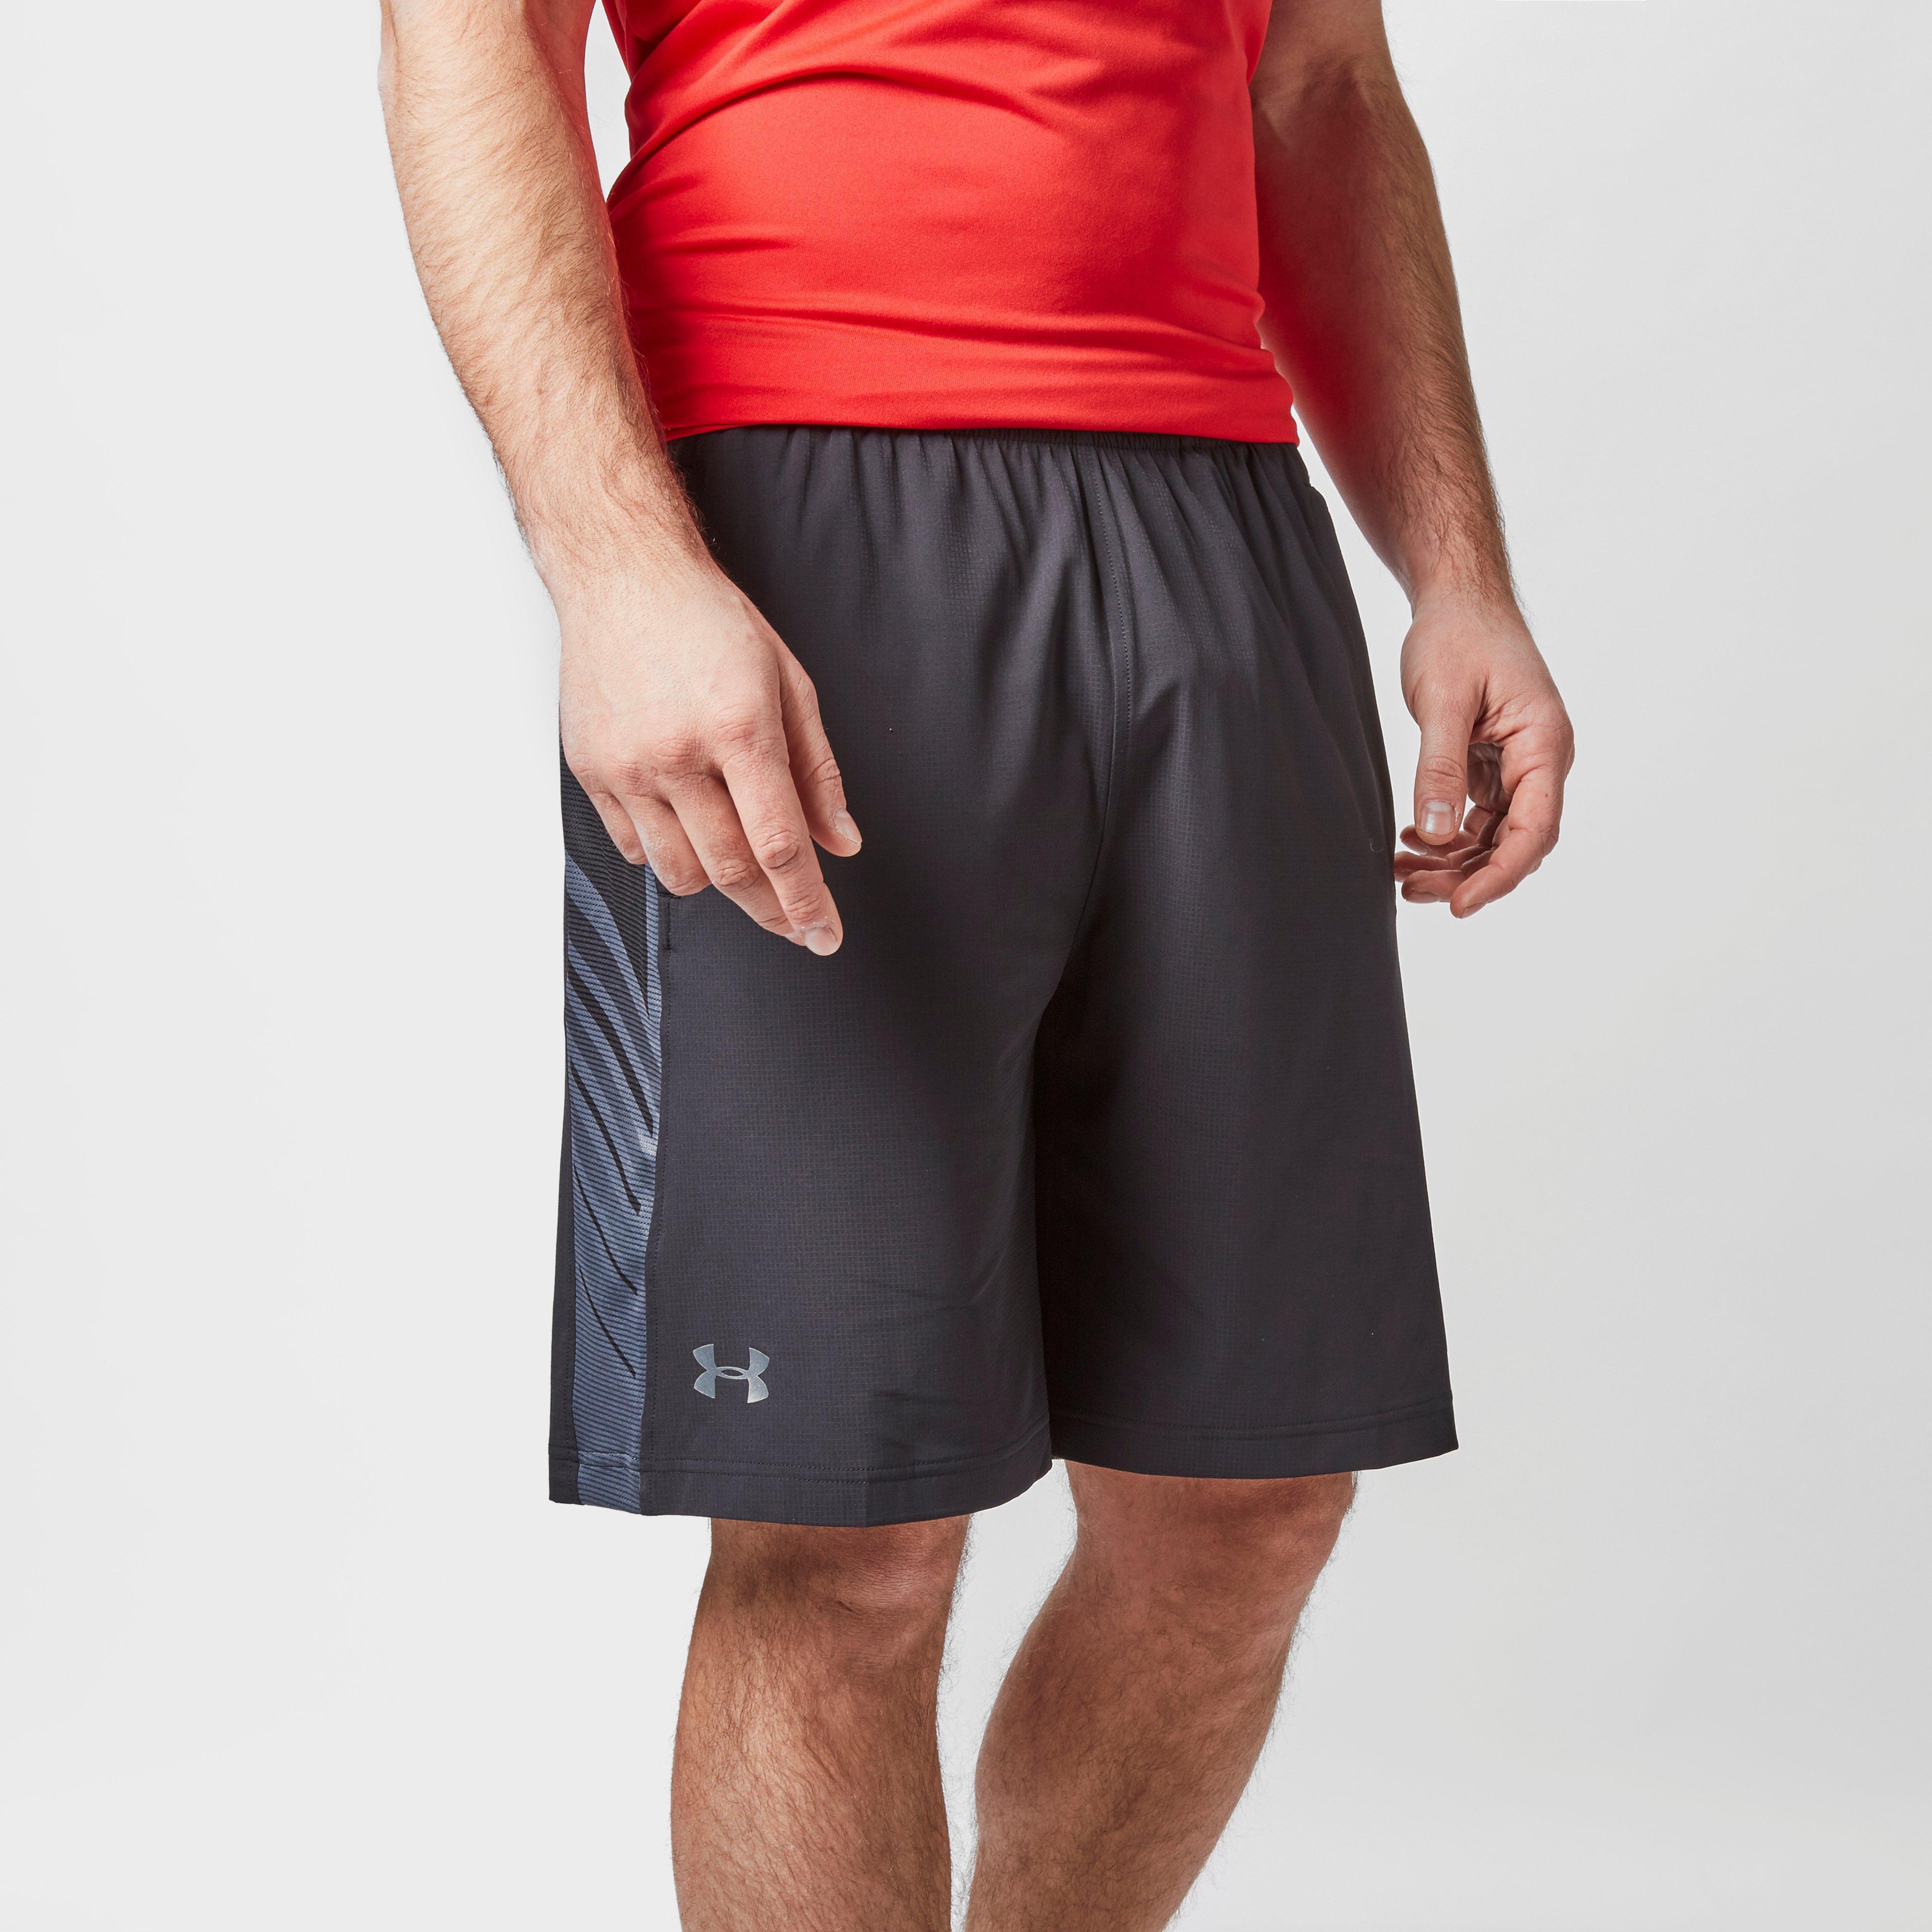 under armour mens shorts. under armour men\u0027s ua supervent shorts. shorts under armour mens